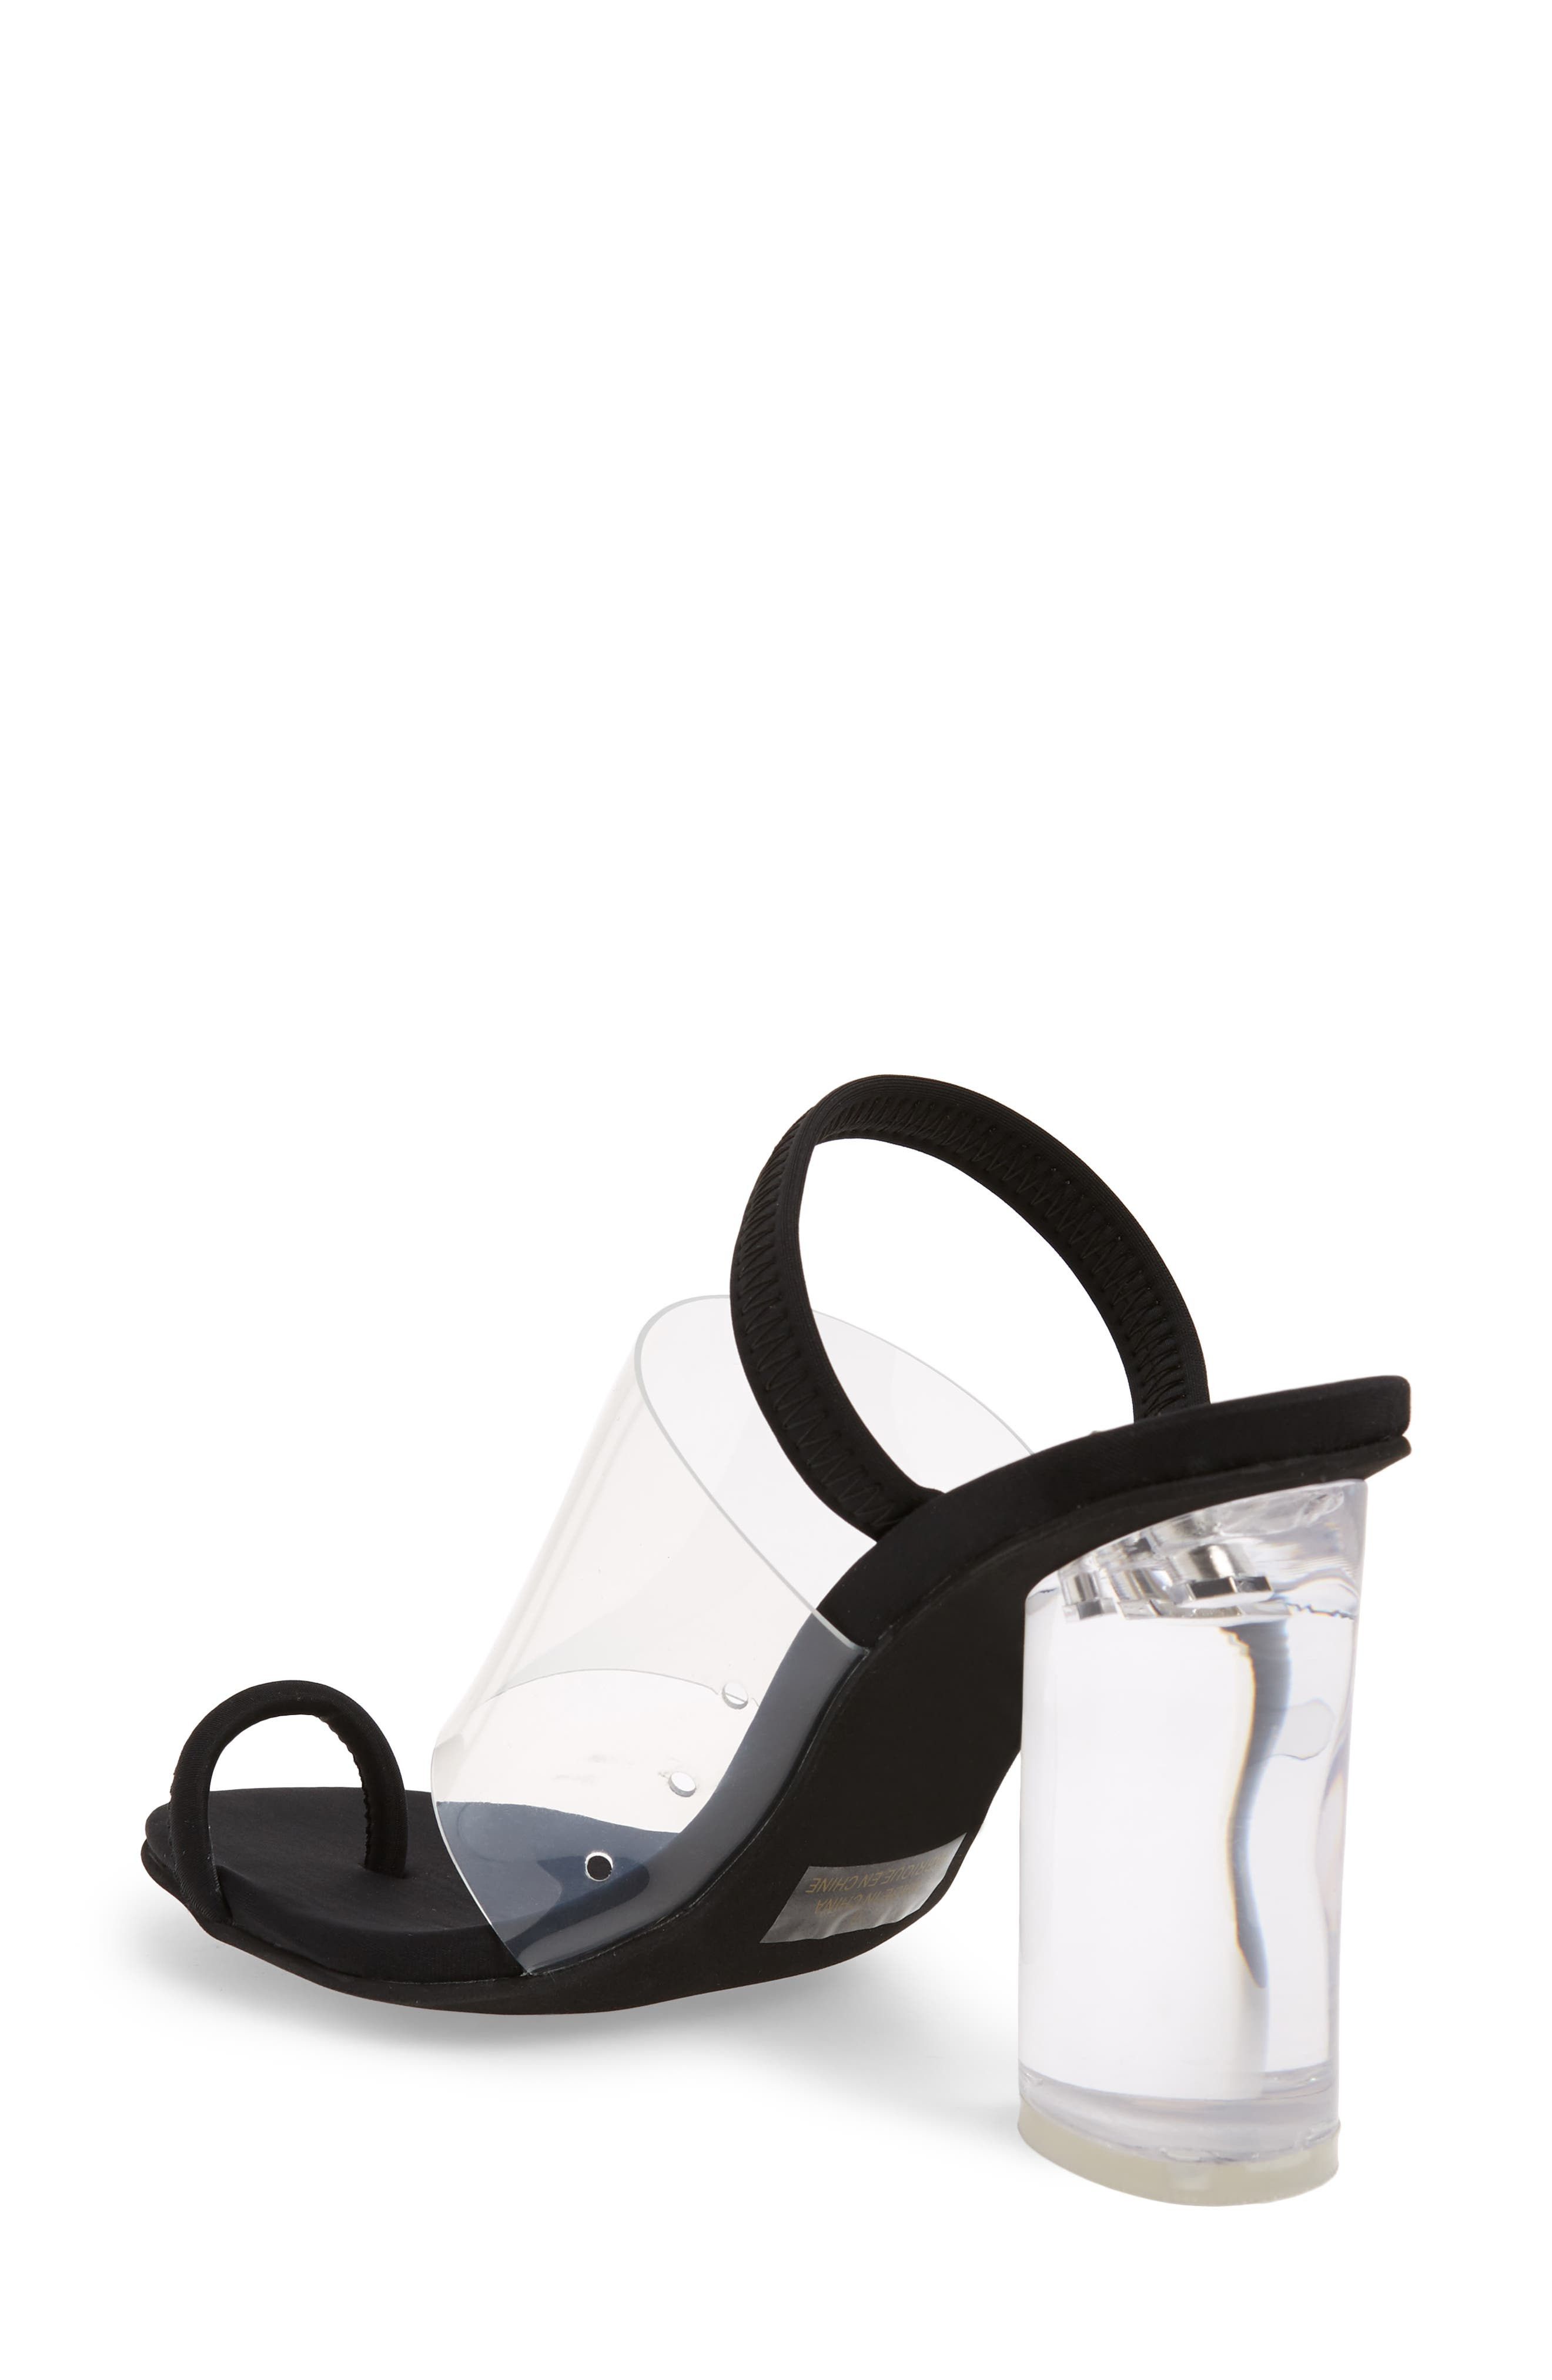 Mania Clear Toe Loop Sandal,                             Alternate thumbnail 2, color,                             BLACK FABRIC